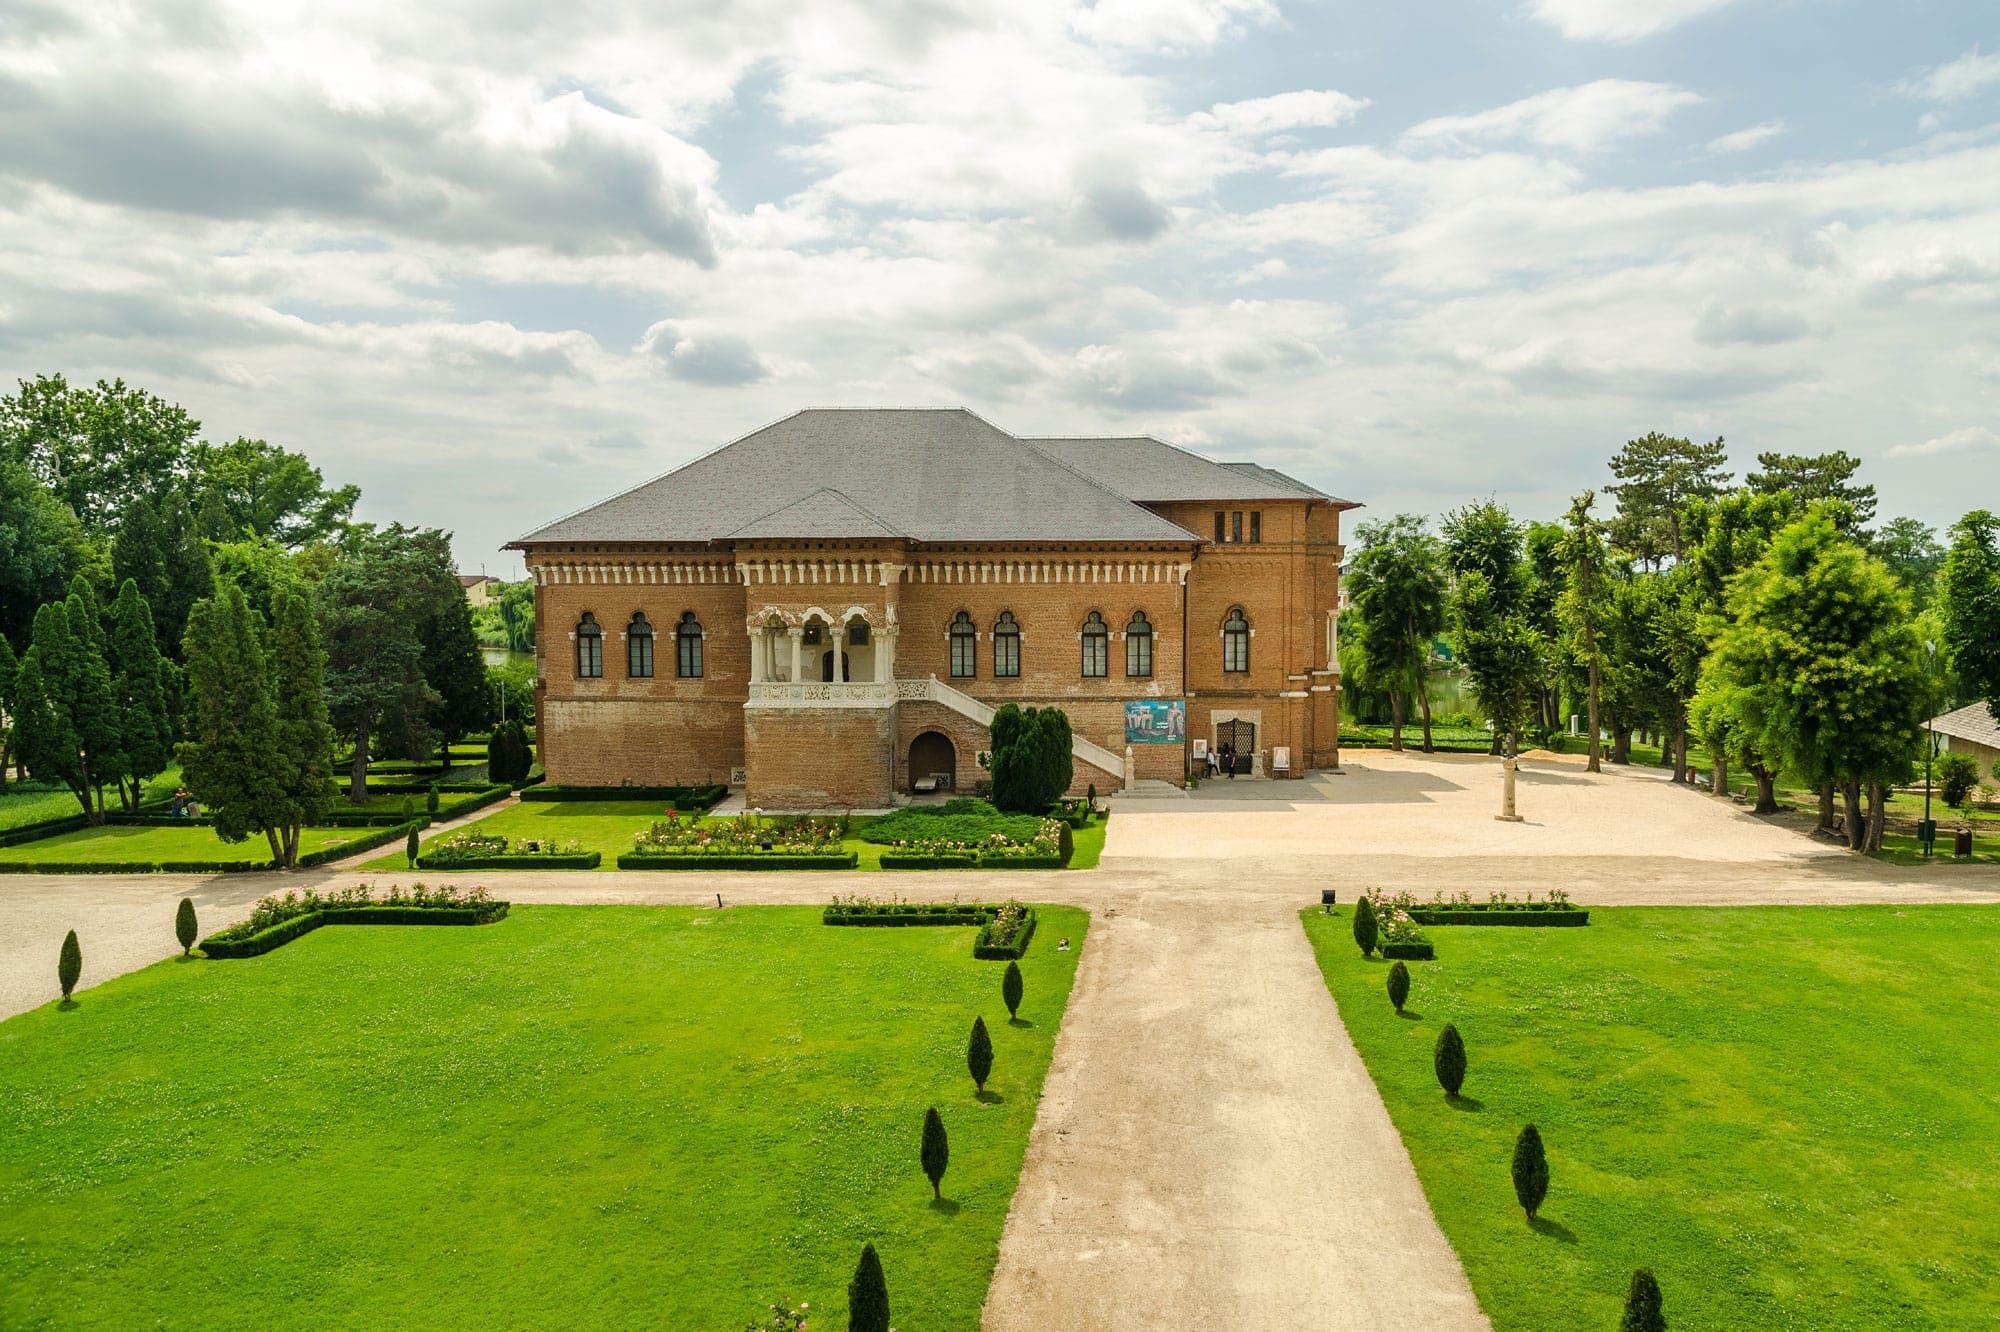 mogosoaia-palace-snagov-monastery-caldarusani-monastery-1